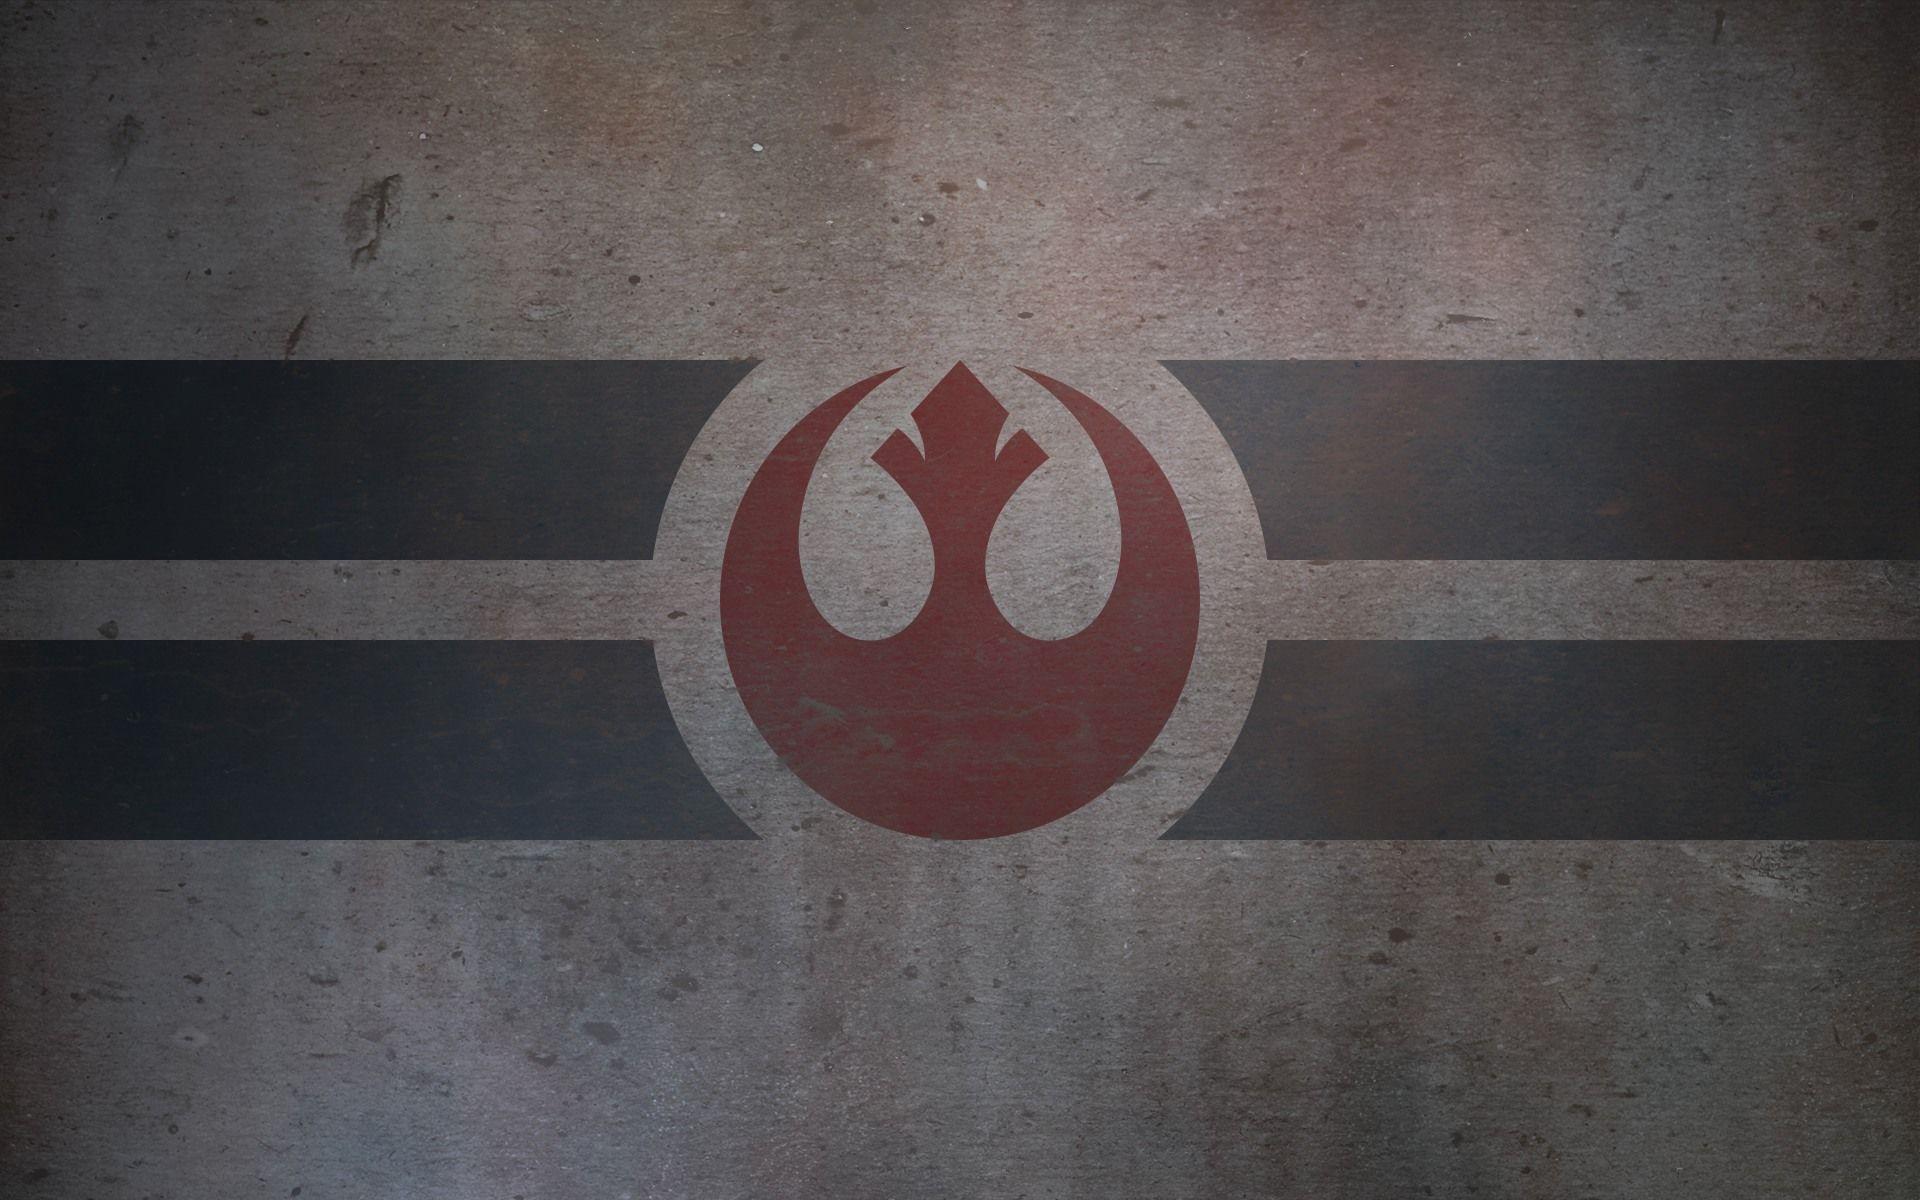 1920x1200 Star Wars Rebels Star Wars Rebellion Logo Wallpaper Comics